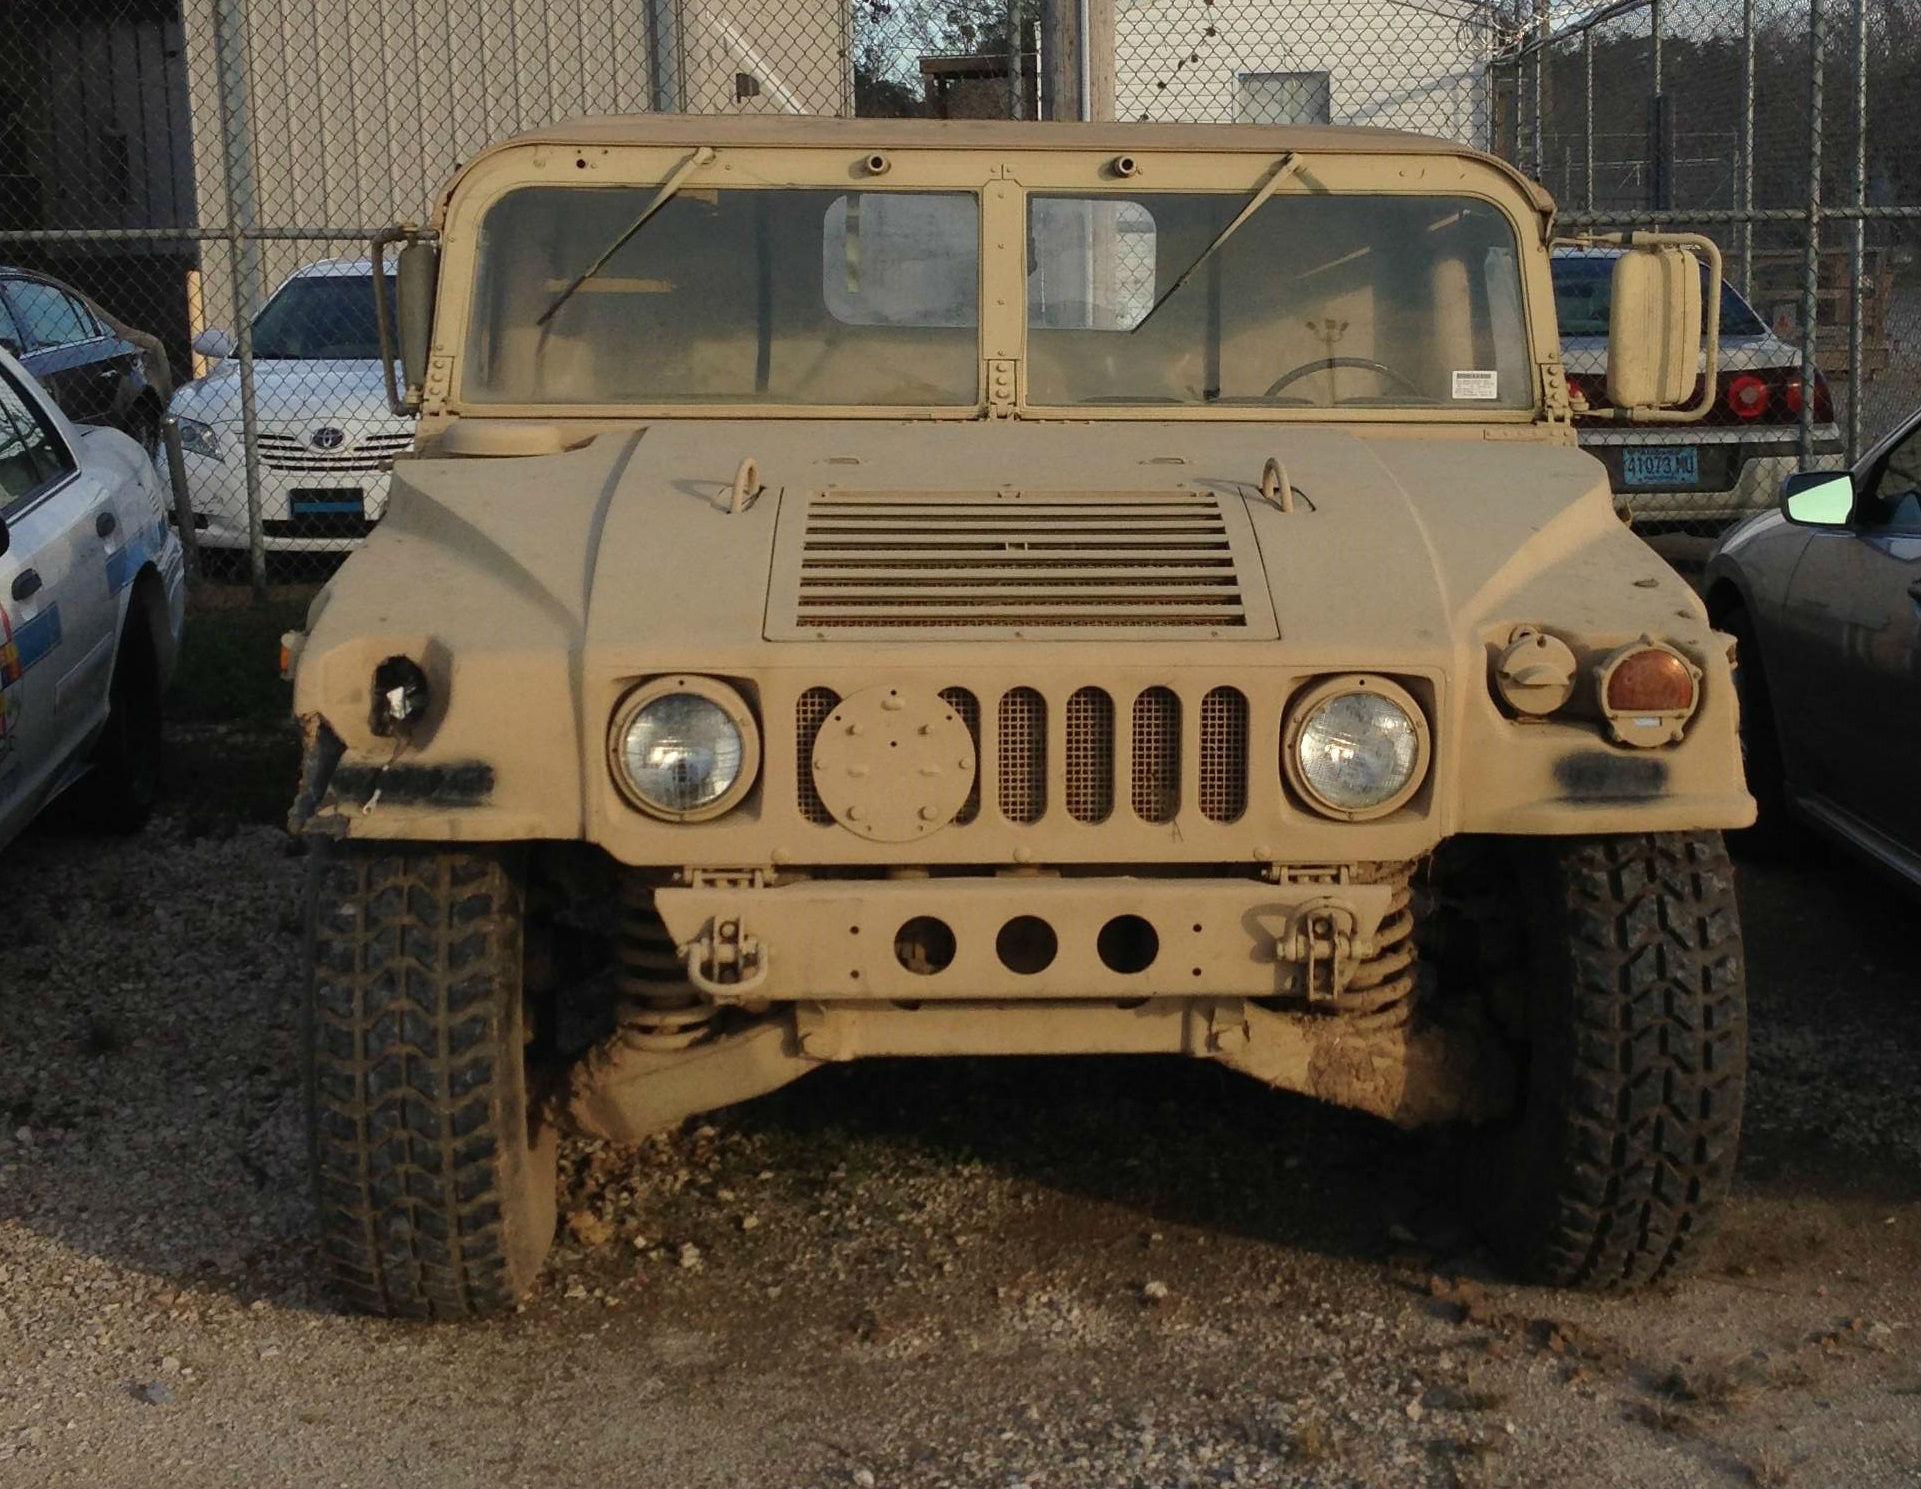 Mobile rakes in assault rifles from military surplus Baldwin